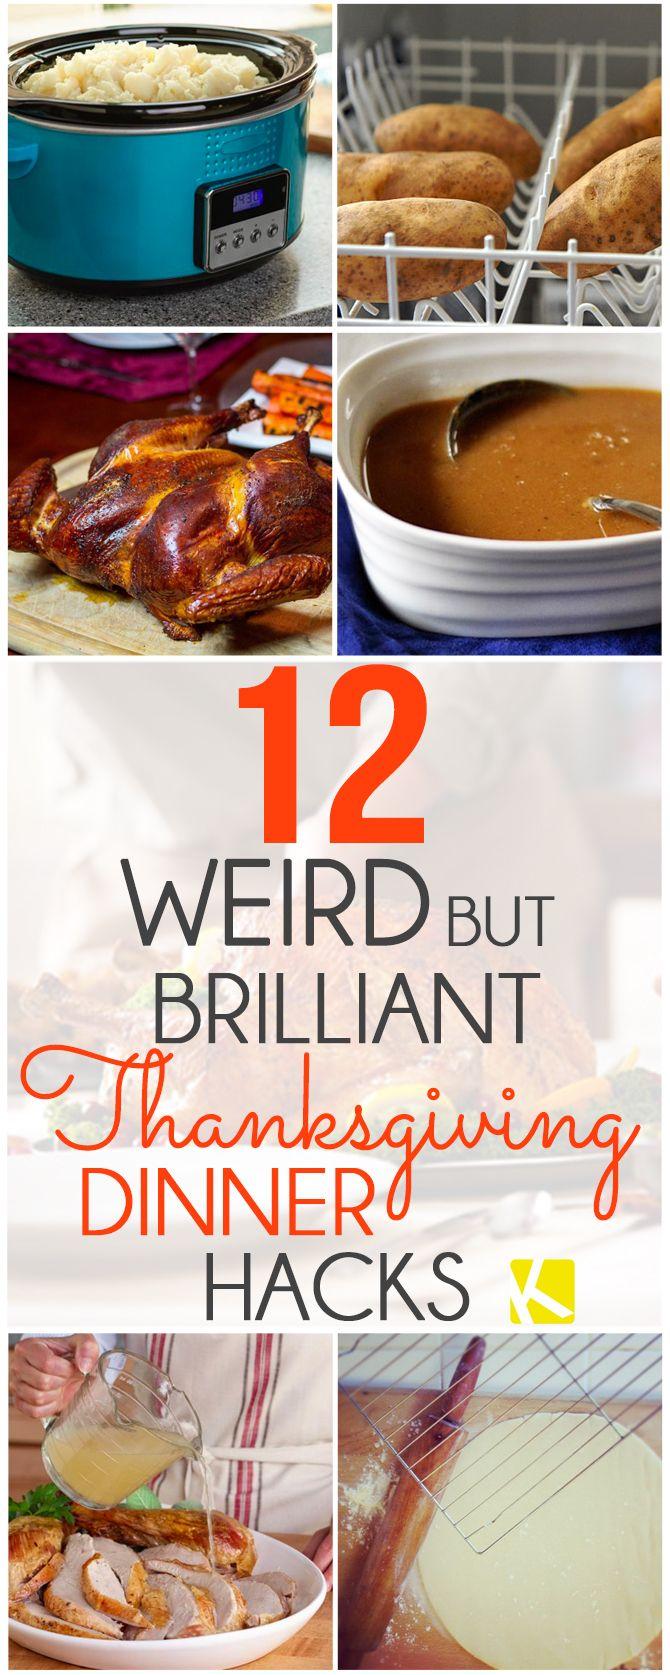 12 Weird But Brilliant Thanksgiving Dinner Hacks